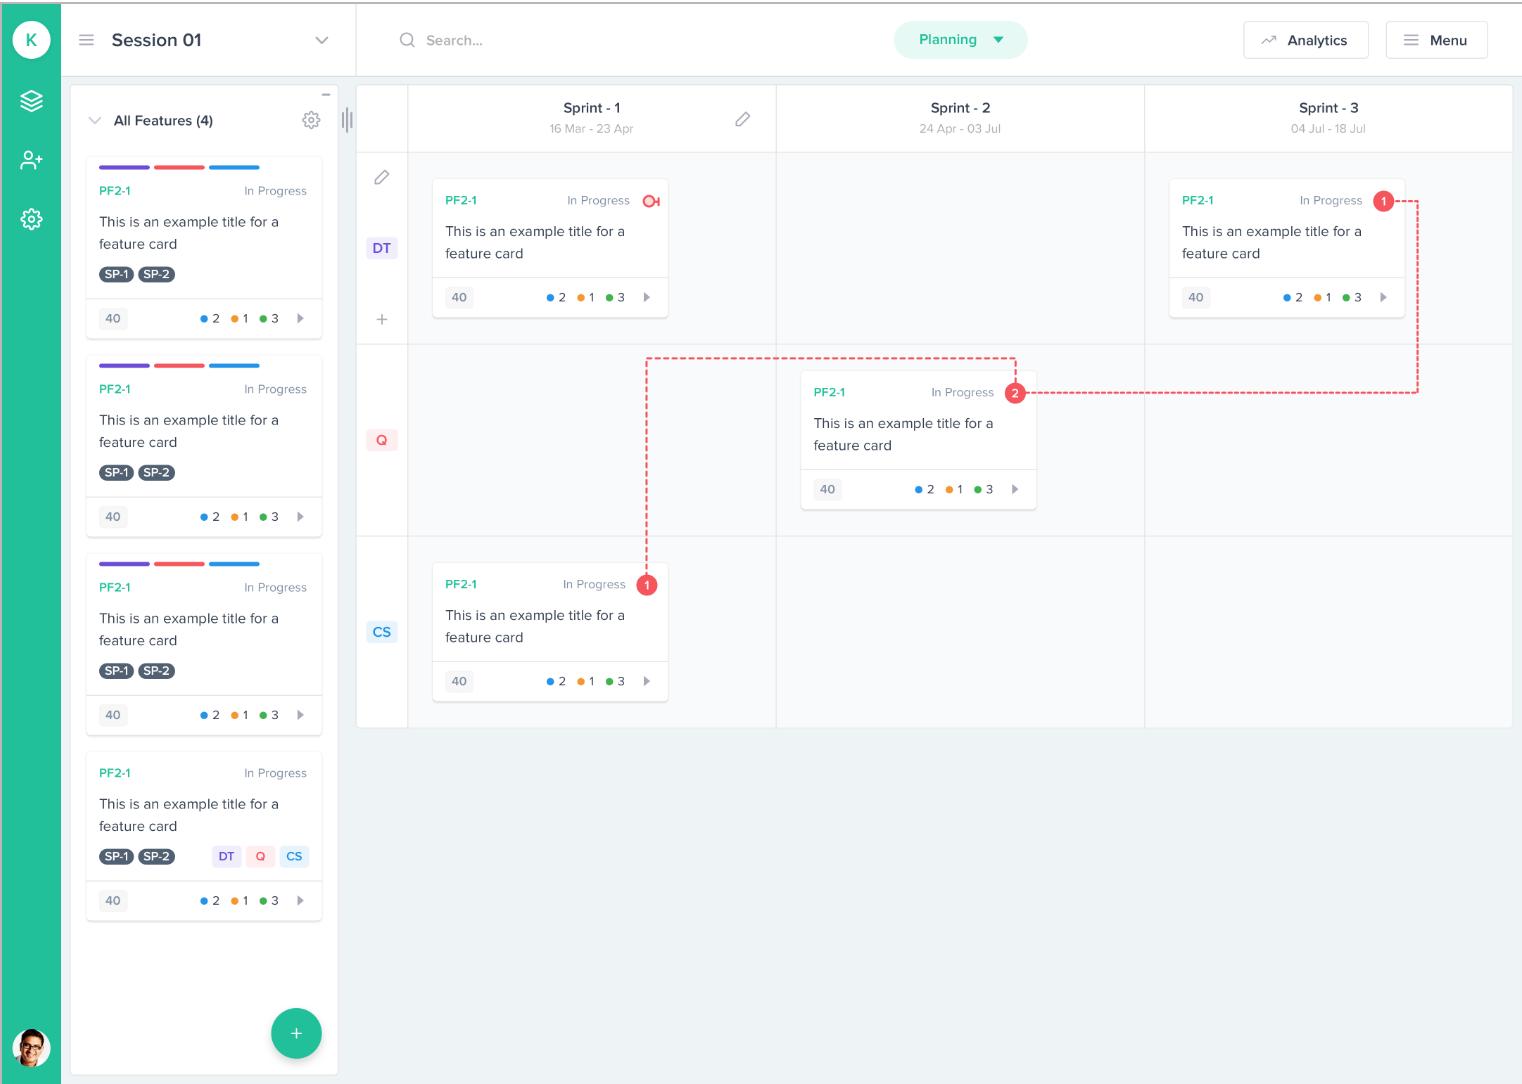 Planning-Kendis-scaled-agile-framwork